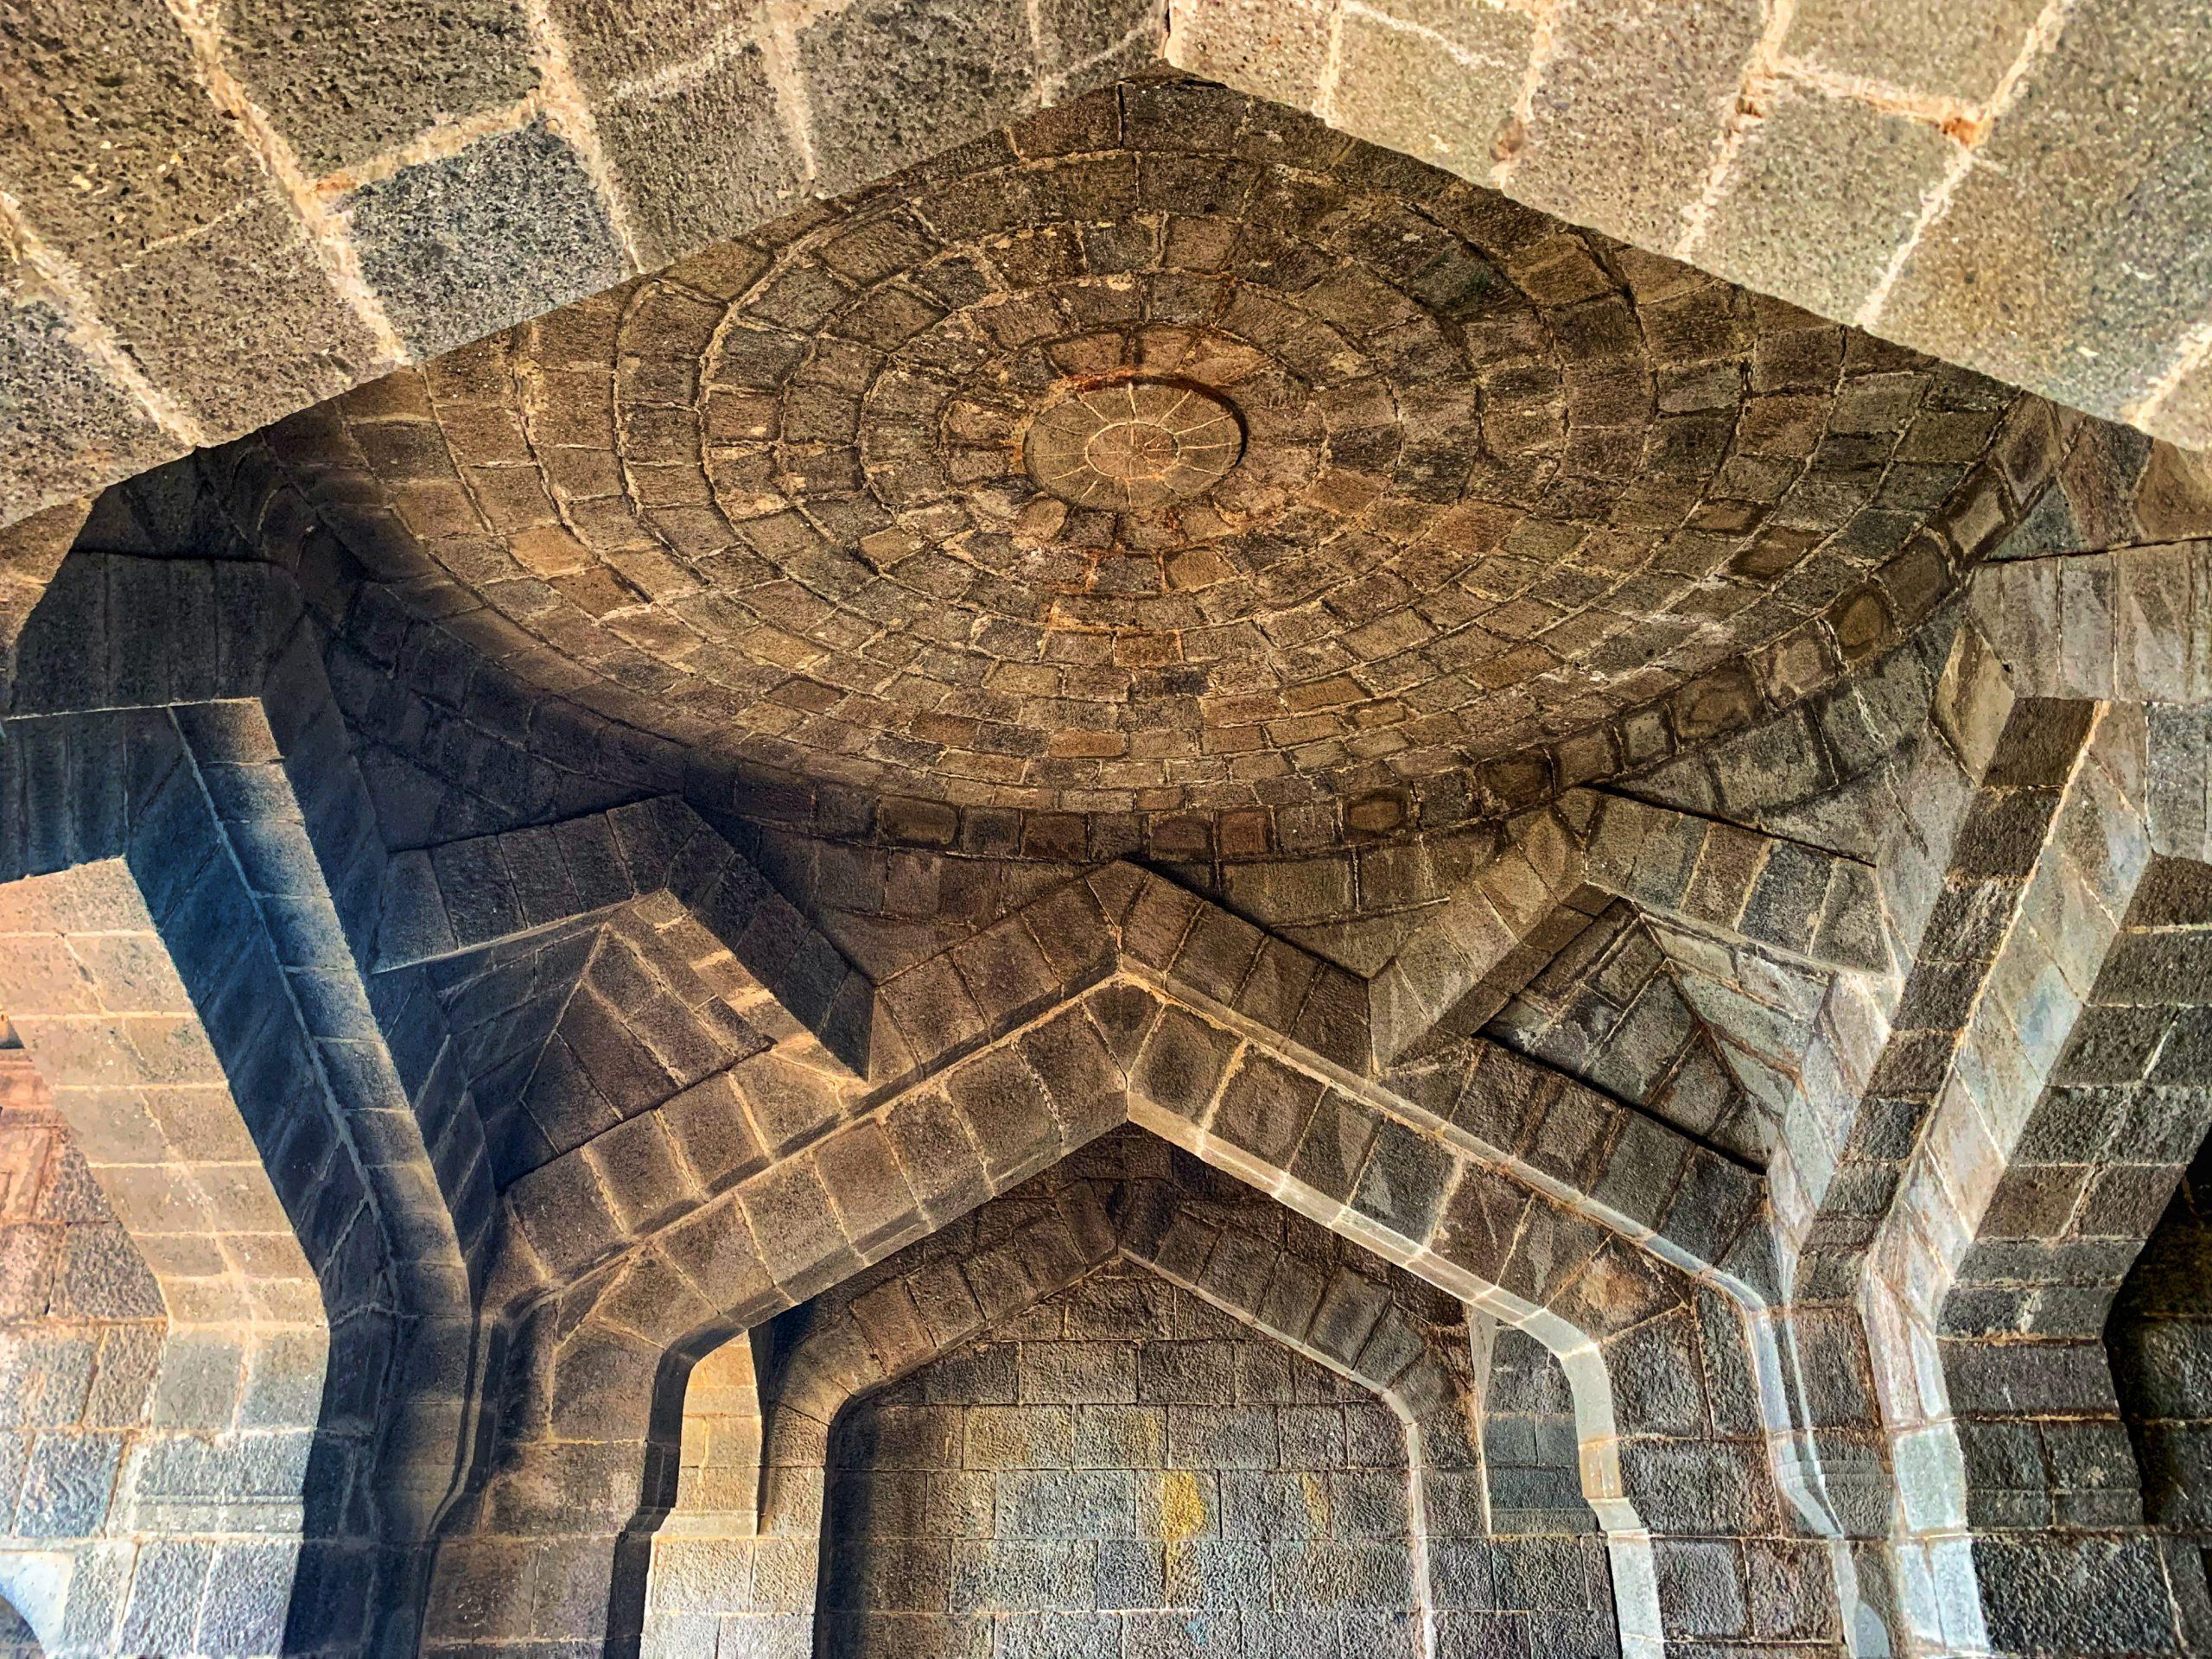 Roof design of fort